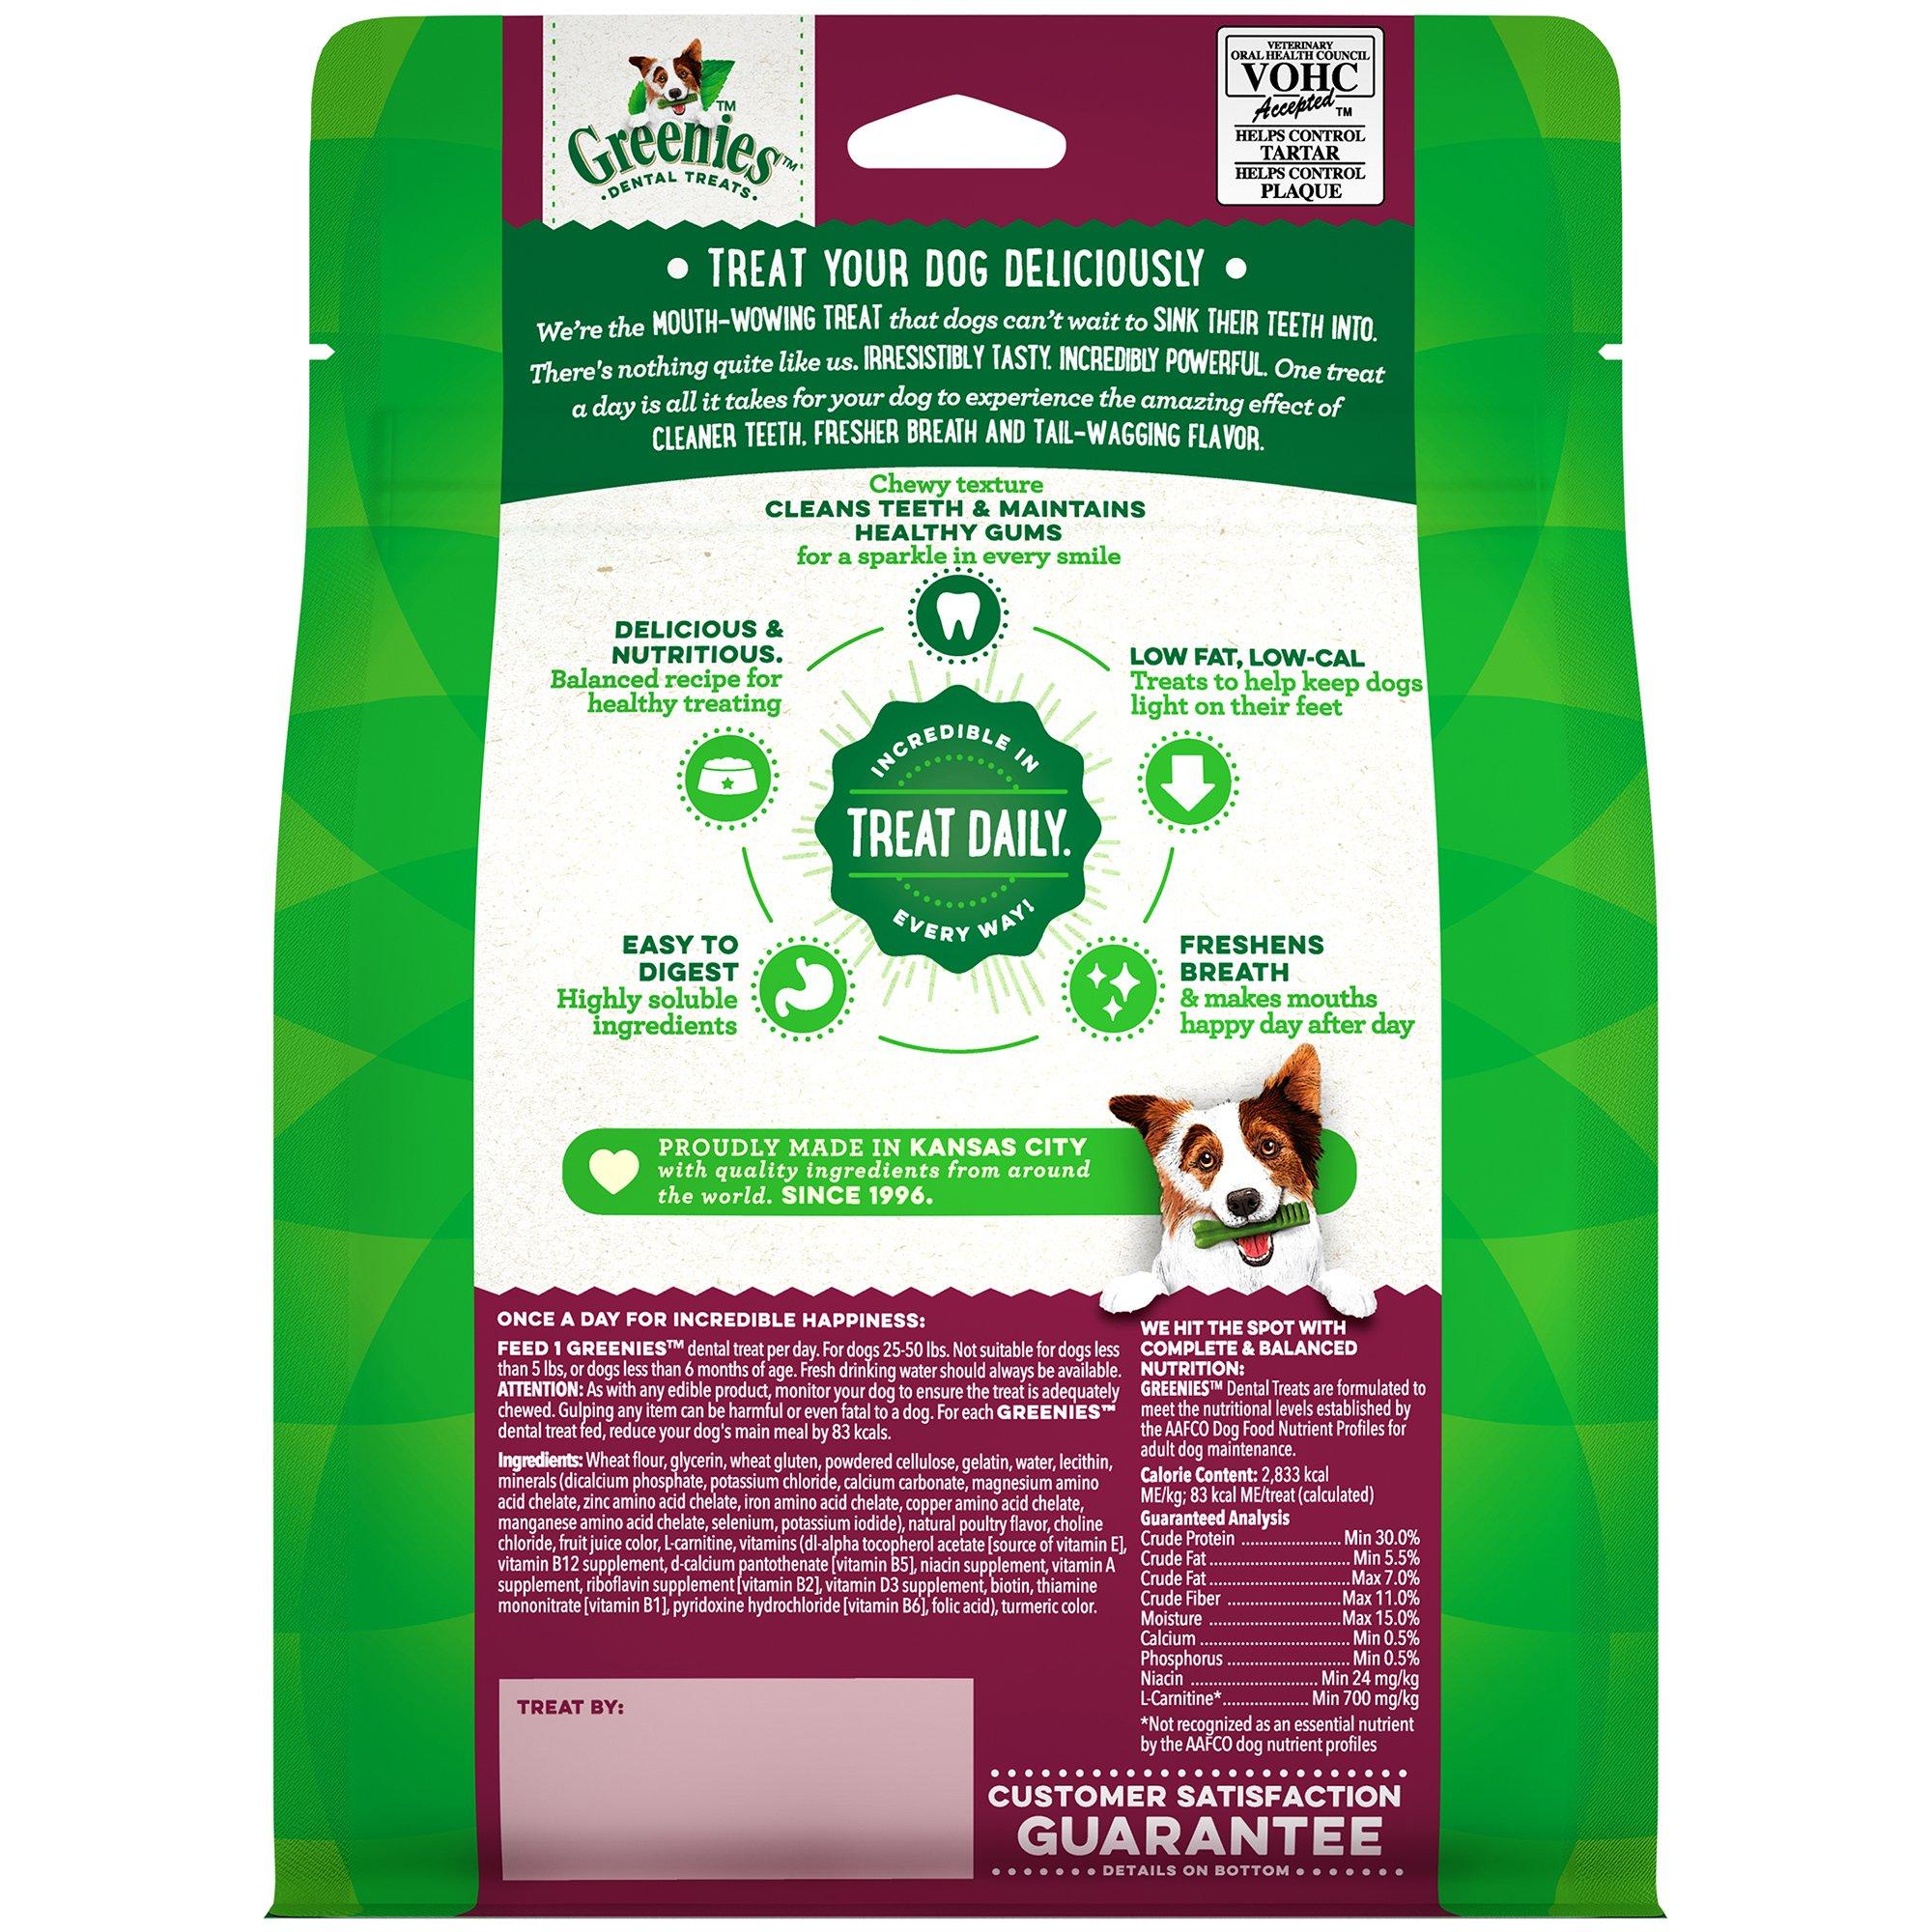 Greenies Weight Management Regular Size Dental Dog Chews - 12 Ounces 12 Treats by Greenies (Image #2)